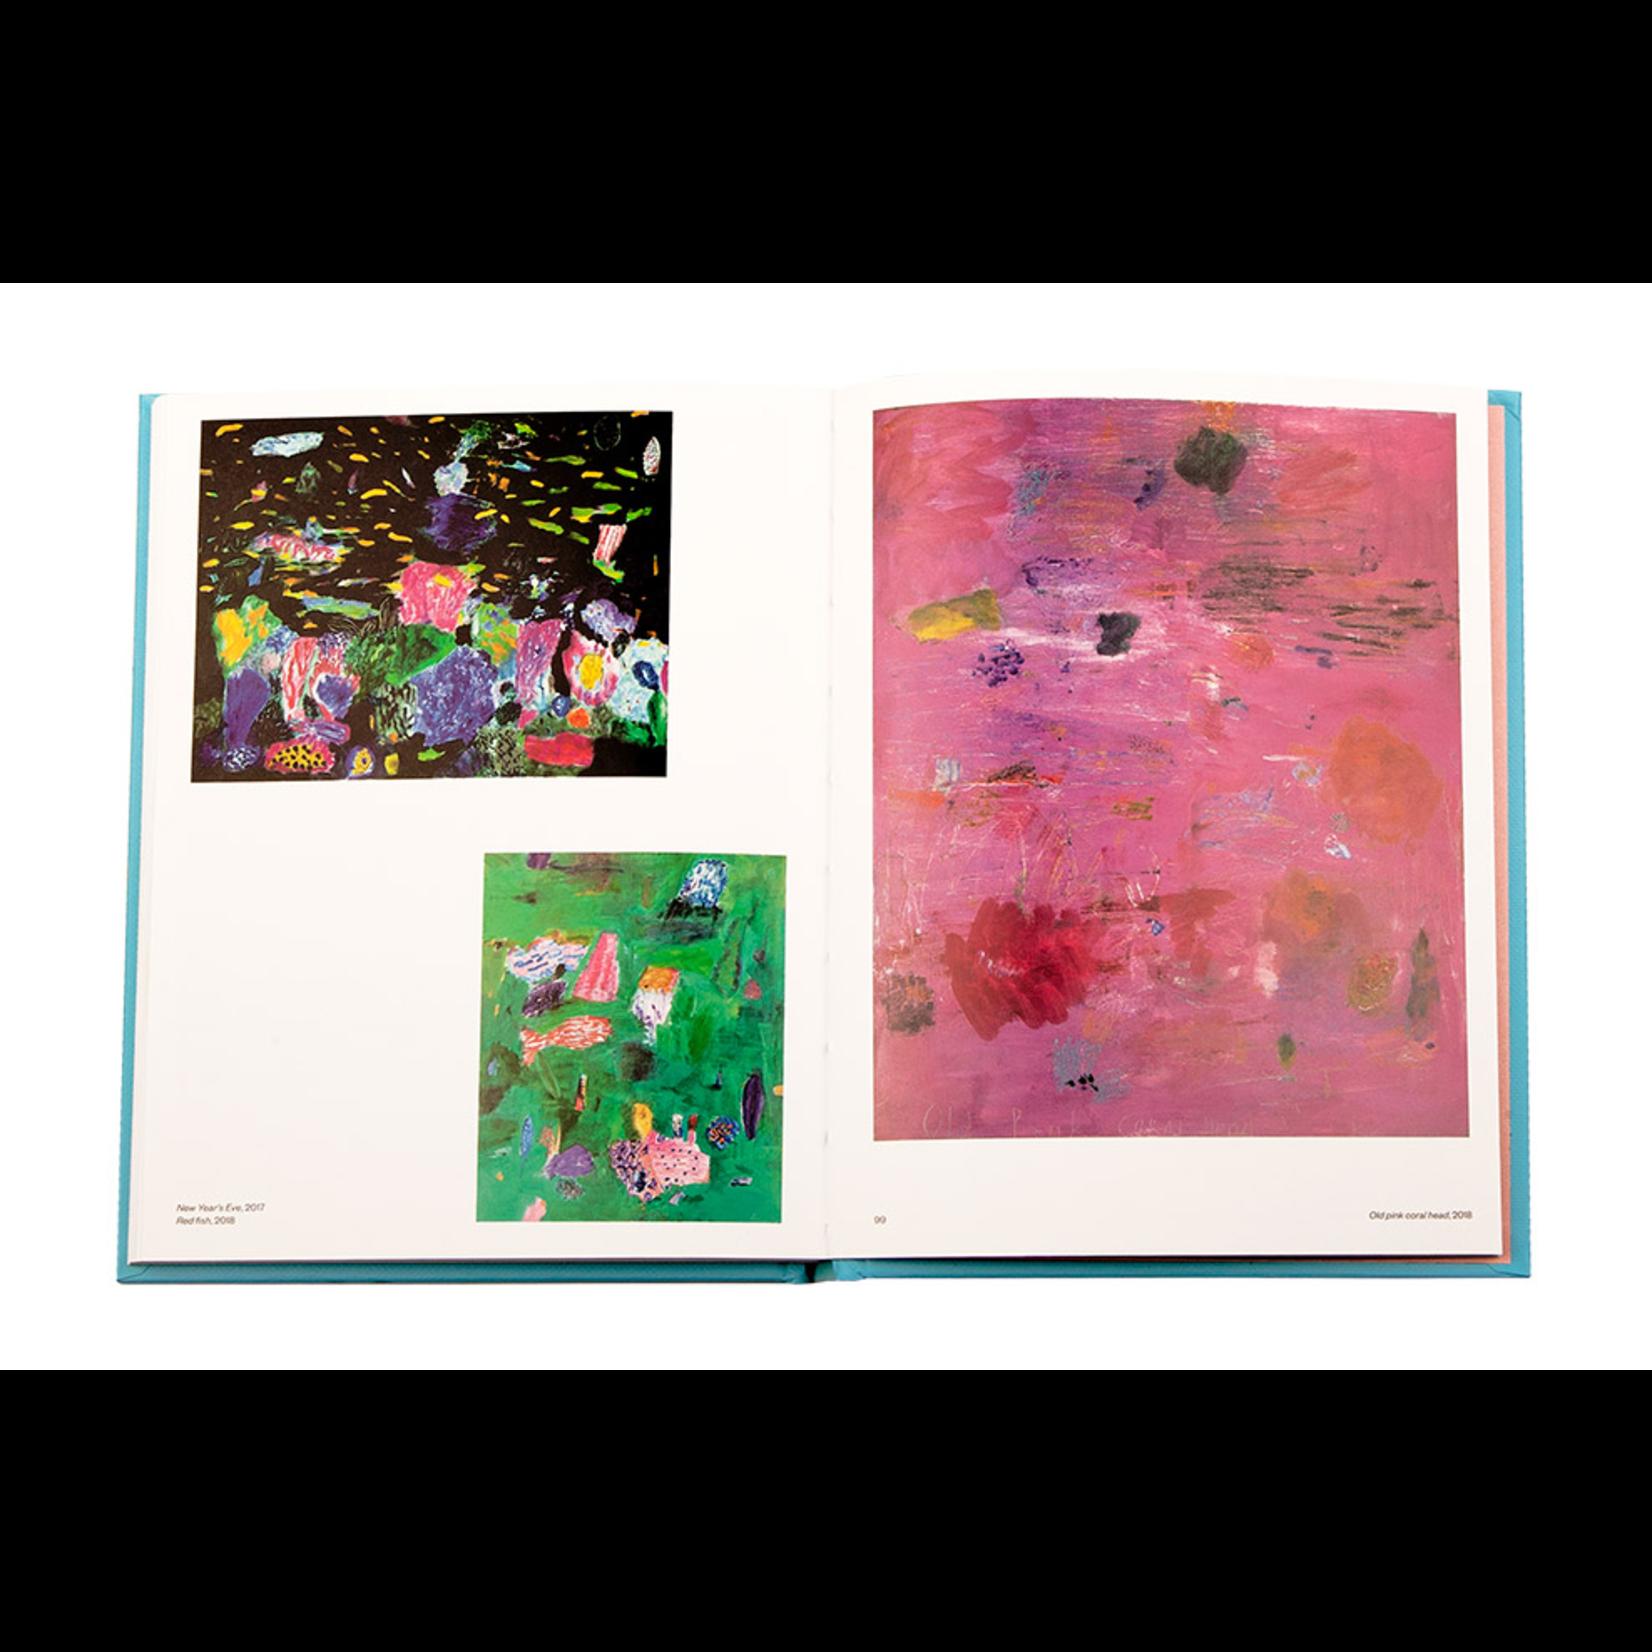 Books & Stationery Book - Ken Done - Reef - Hardcover mini book